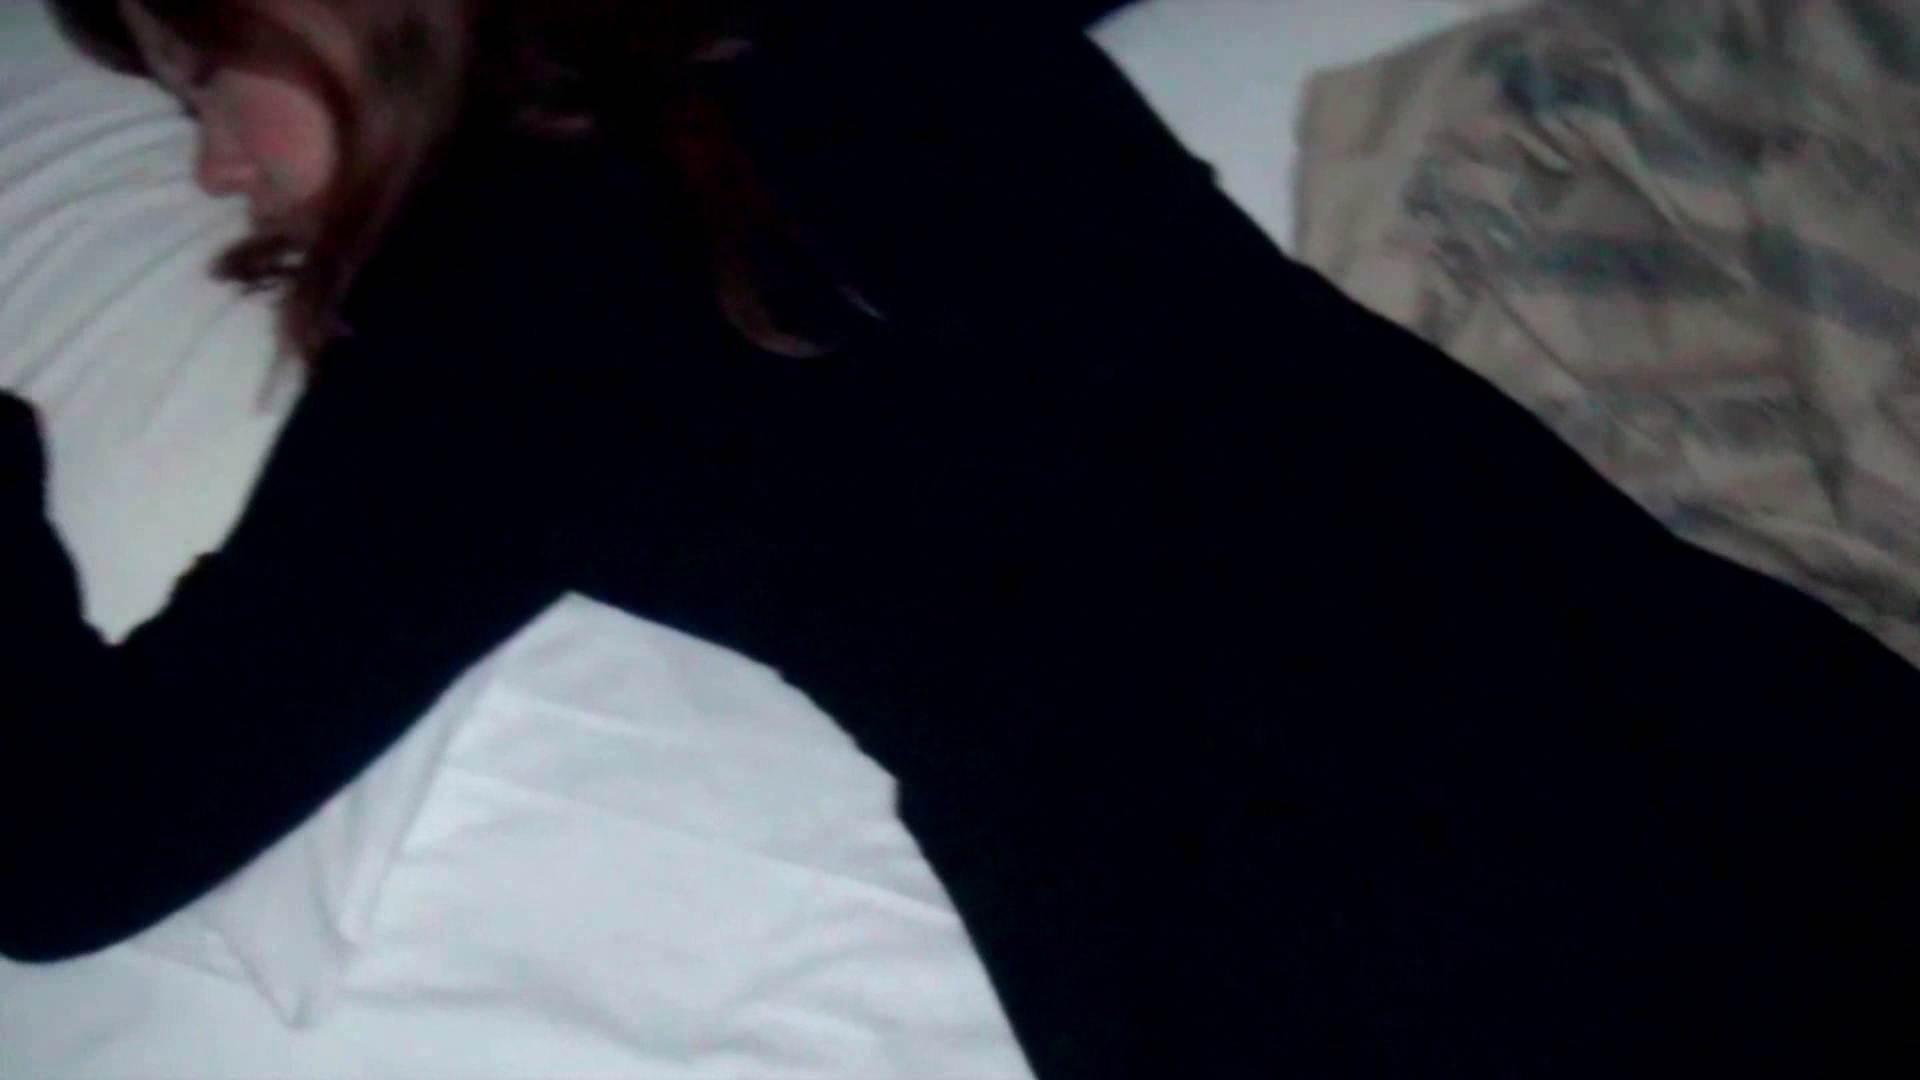 vol.33 【H・Kちゃん】 セクシー系ギャル現役JD 1回目 いじくり セックス画像 84画像 34